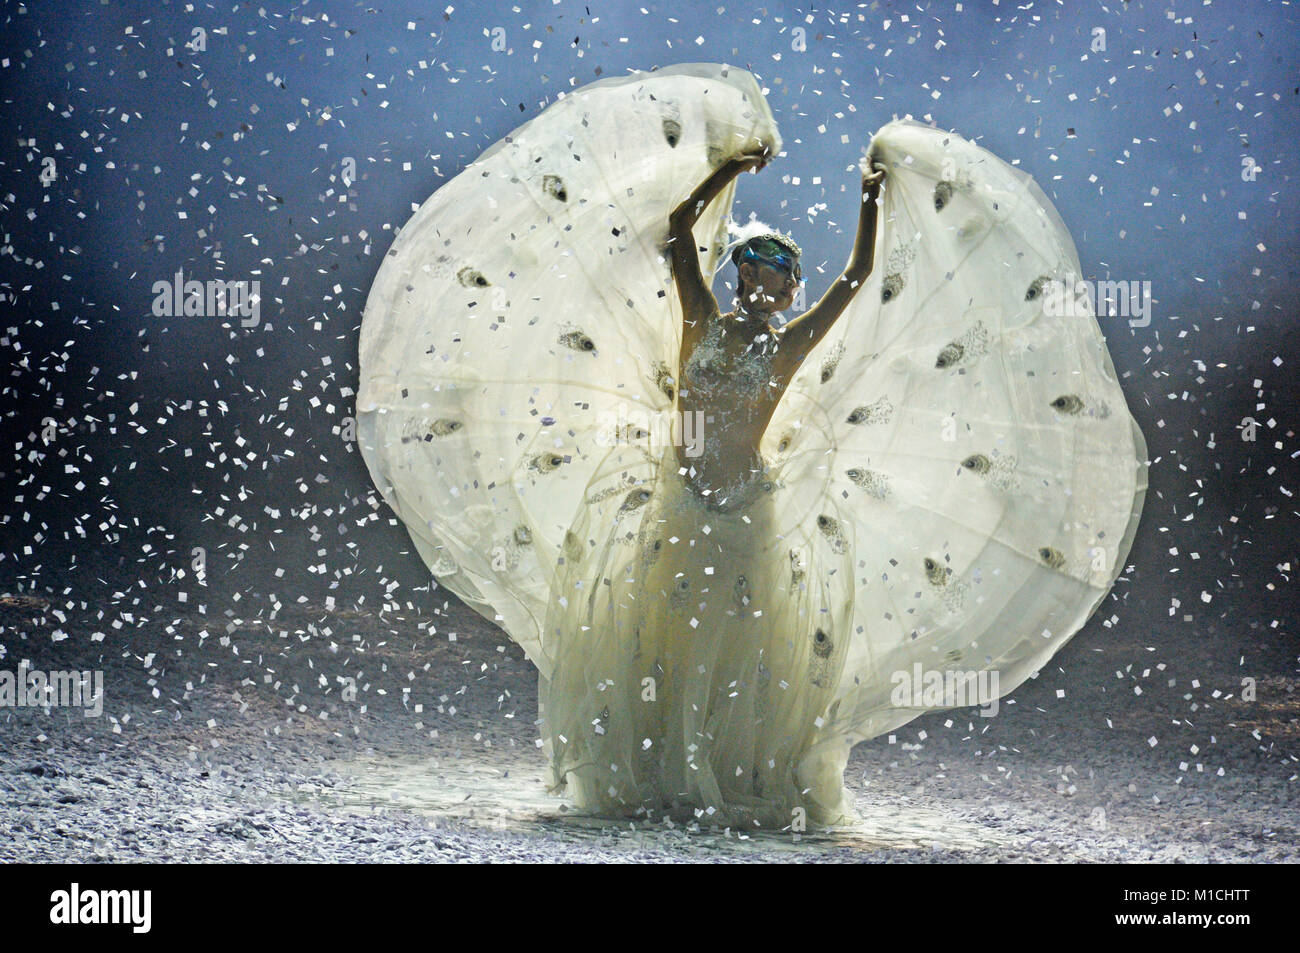 Tianjin, China. 29th Jan, 2018. Chinese dancing master Yang Liping performs in her dance drama 'Peacock of Winter' - Stock Image